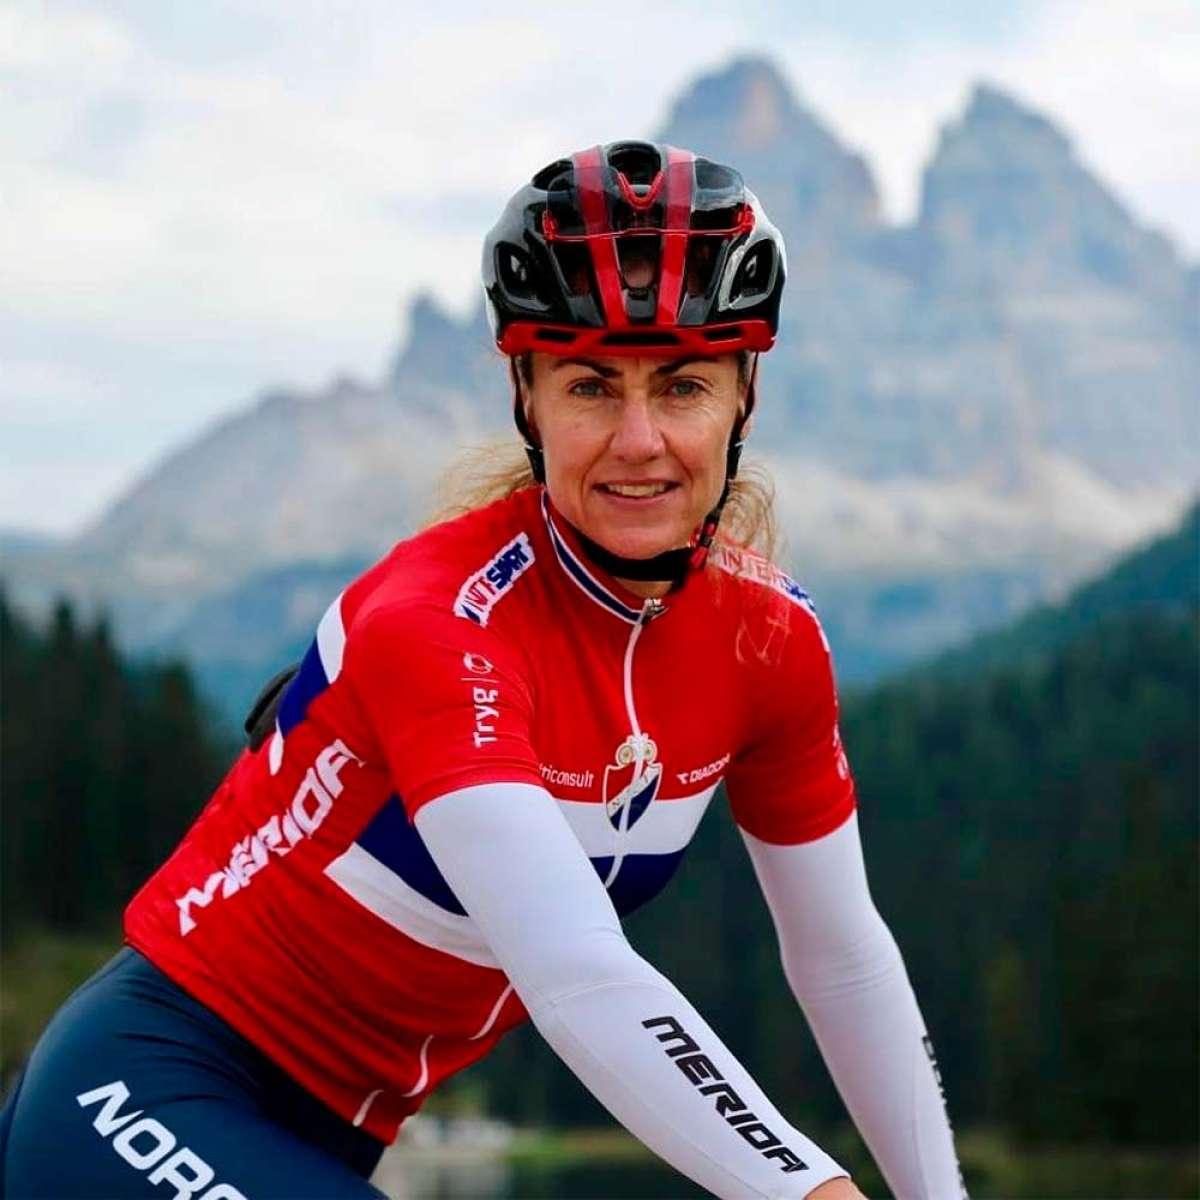 En TodoMountainBike: Gunn-Rita Dahle anuncia su retirada de la competición profesional